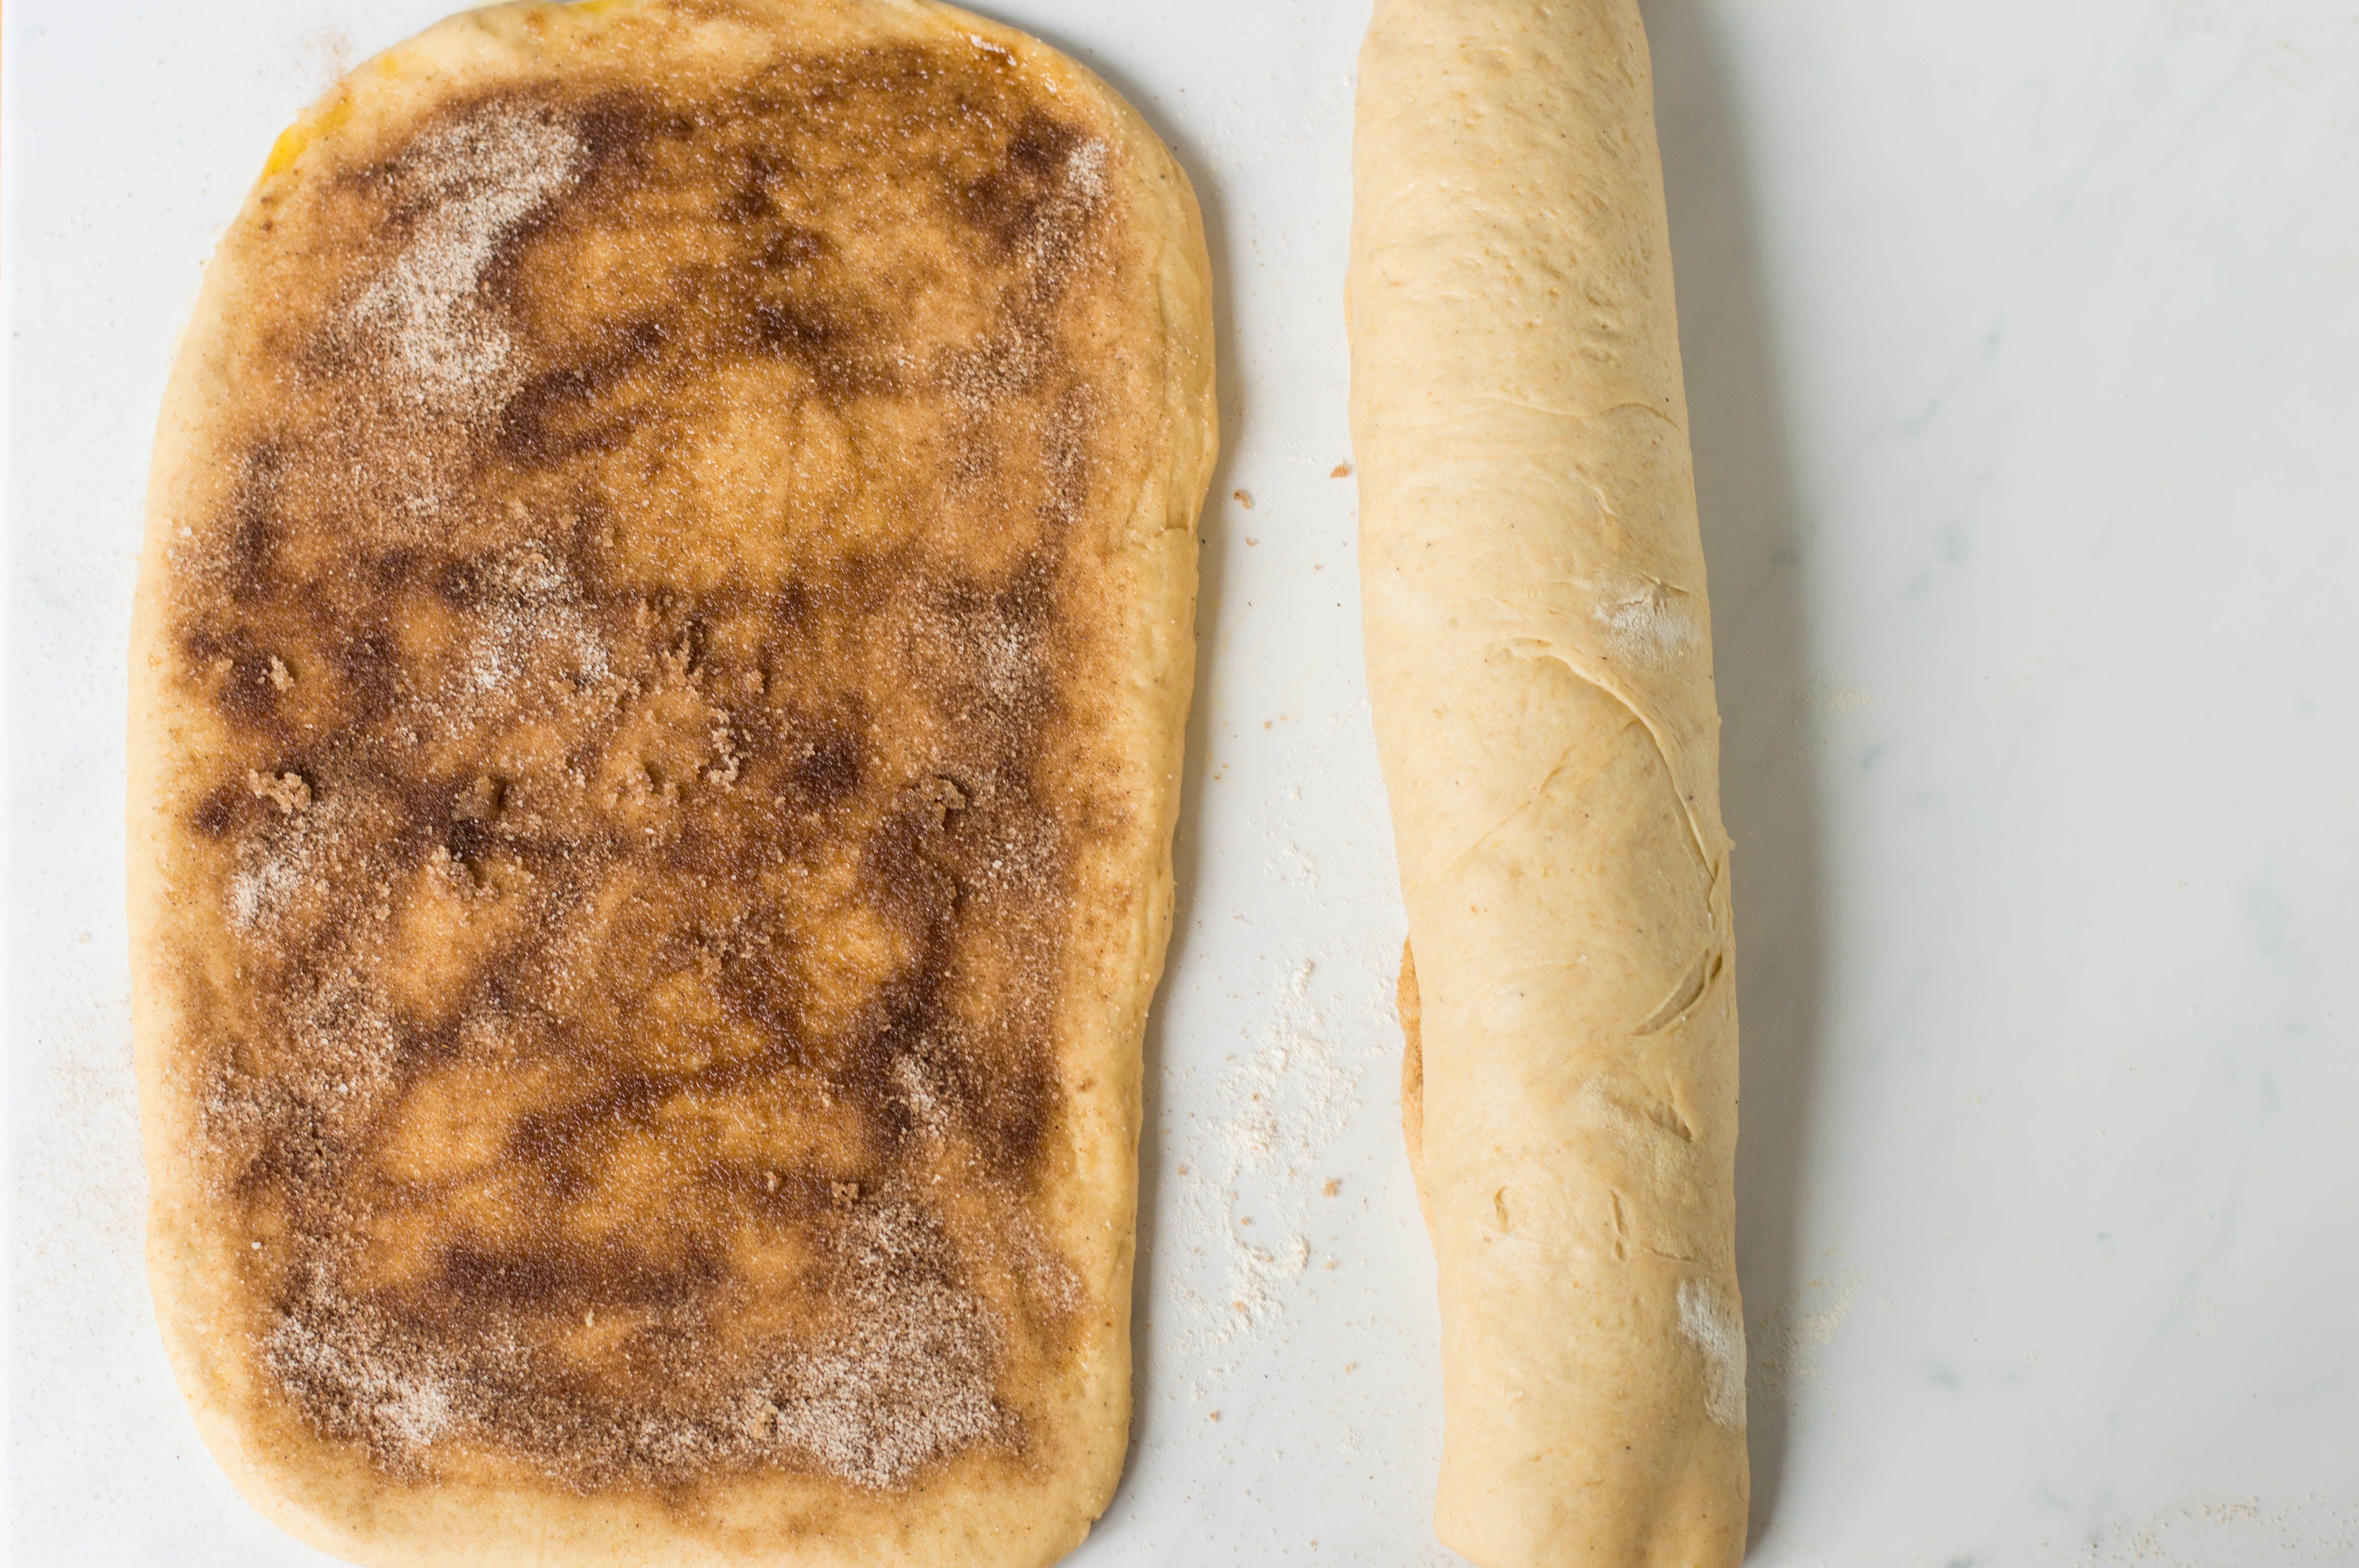 Cinnamon sugar mixture sprinkled onto dough